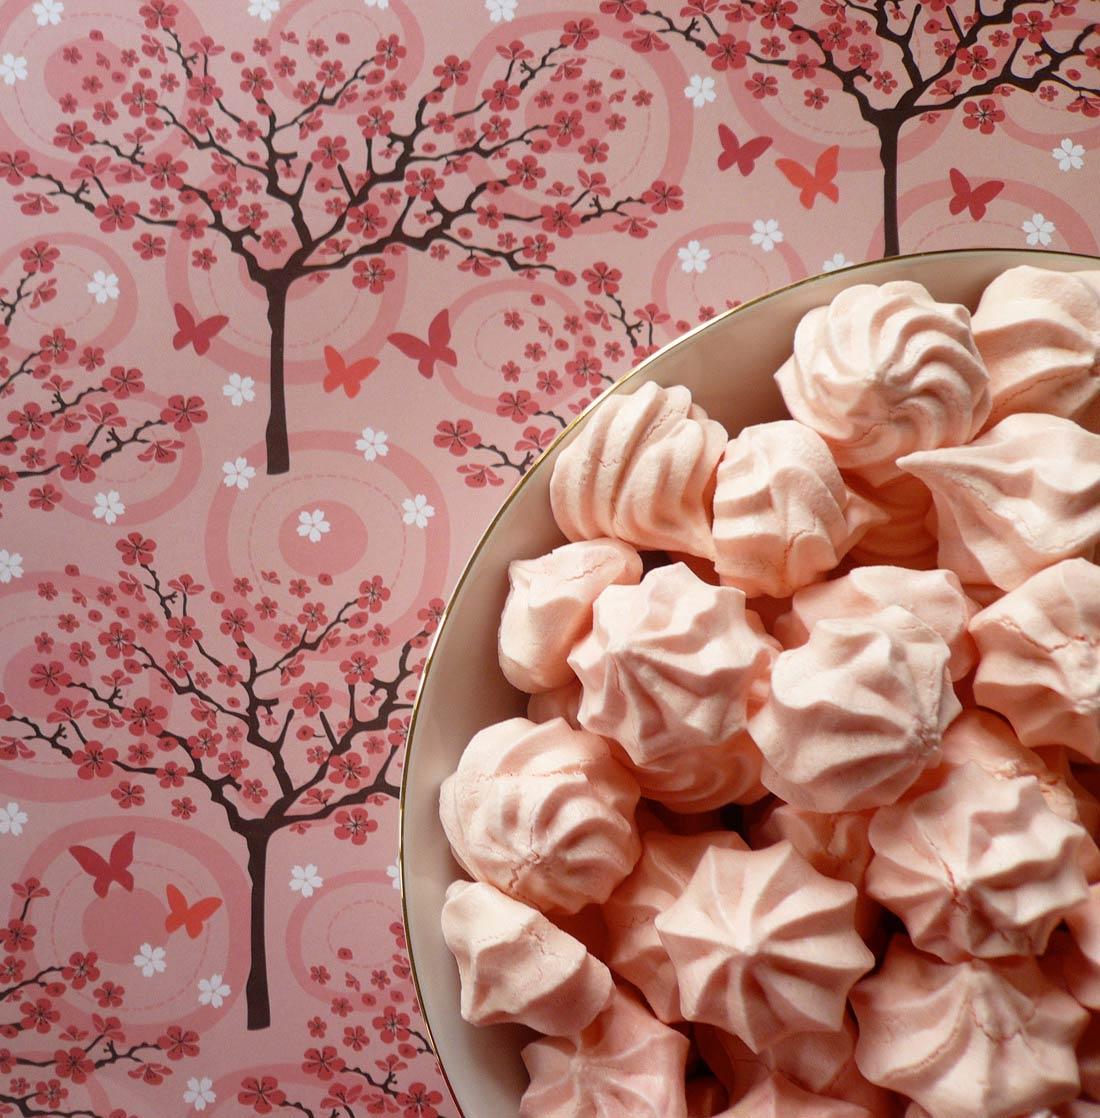 Recette de mini meringues girly